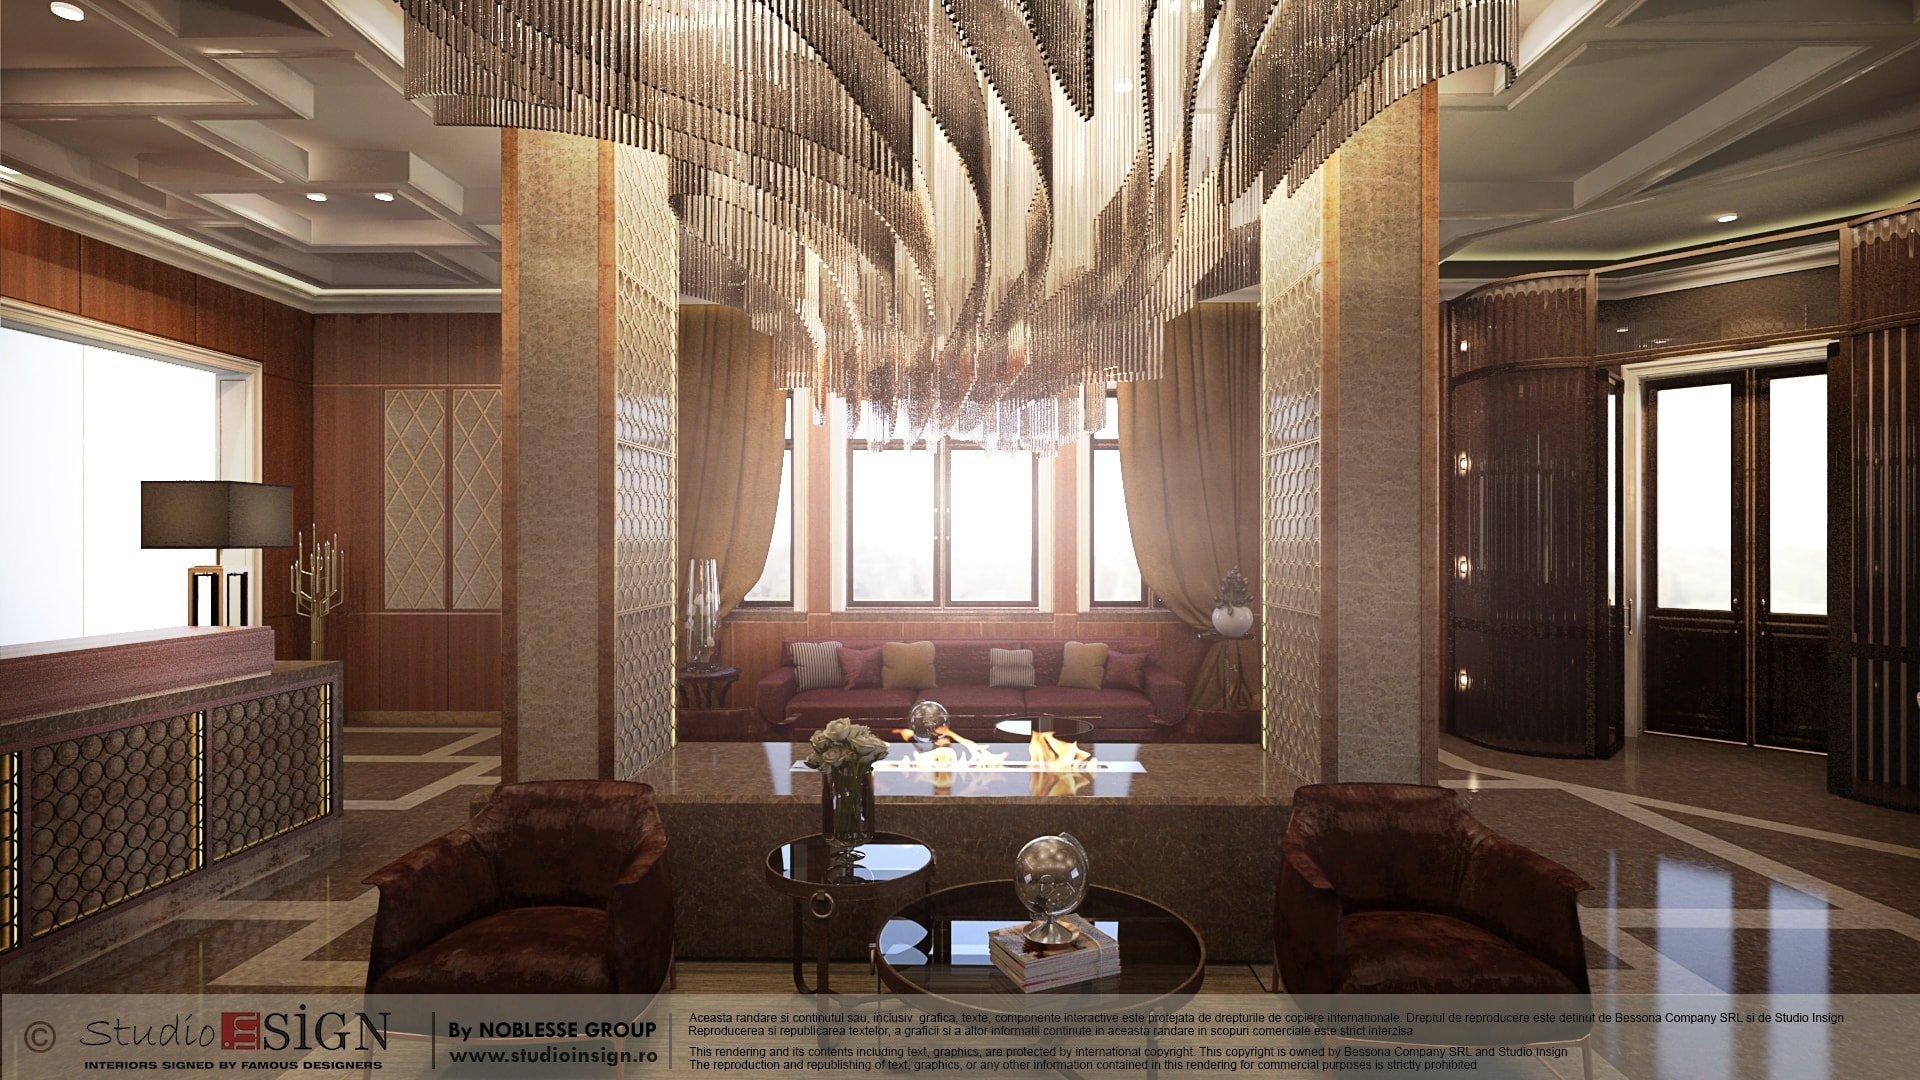 Lobby lounge hotel brasov classic interior design for Classic hotel design